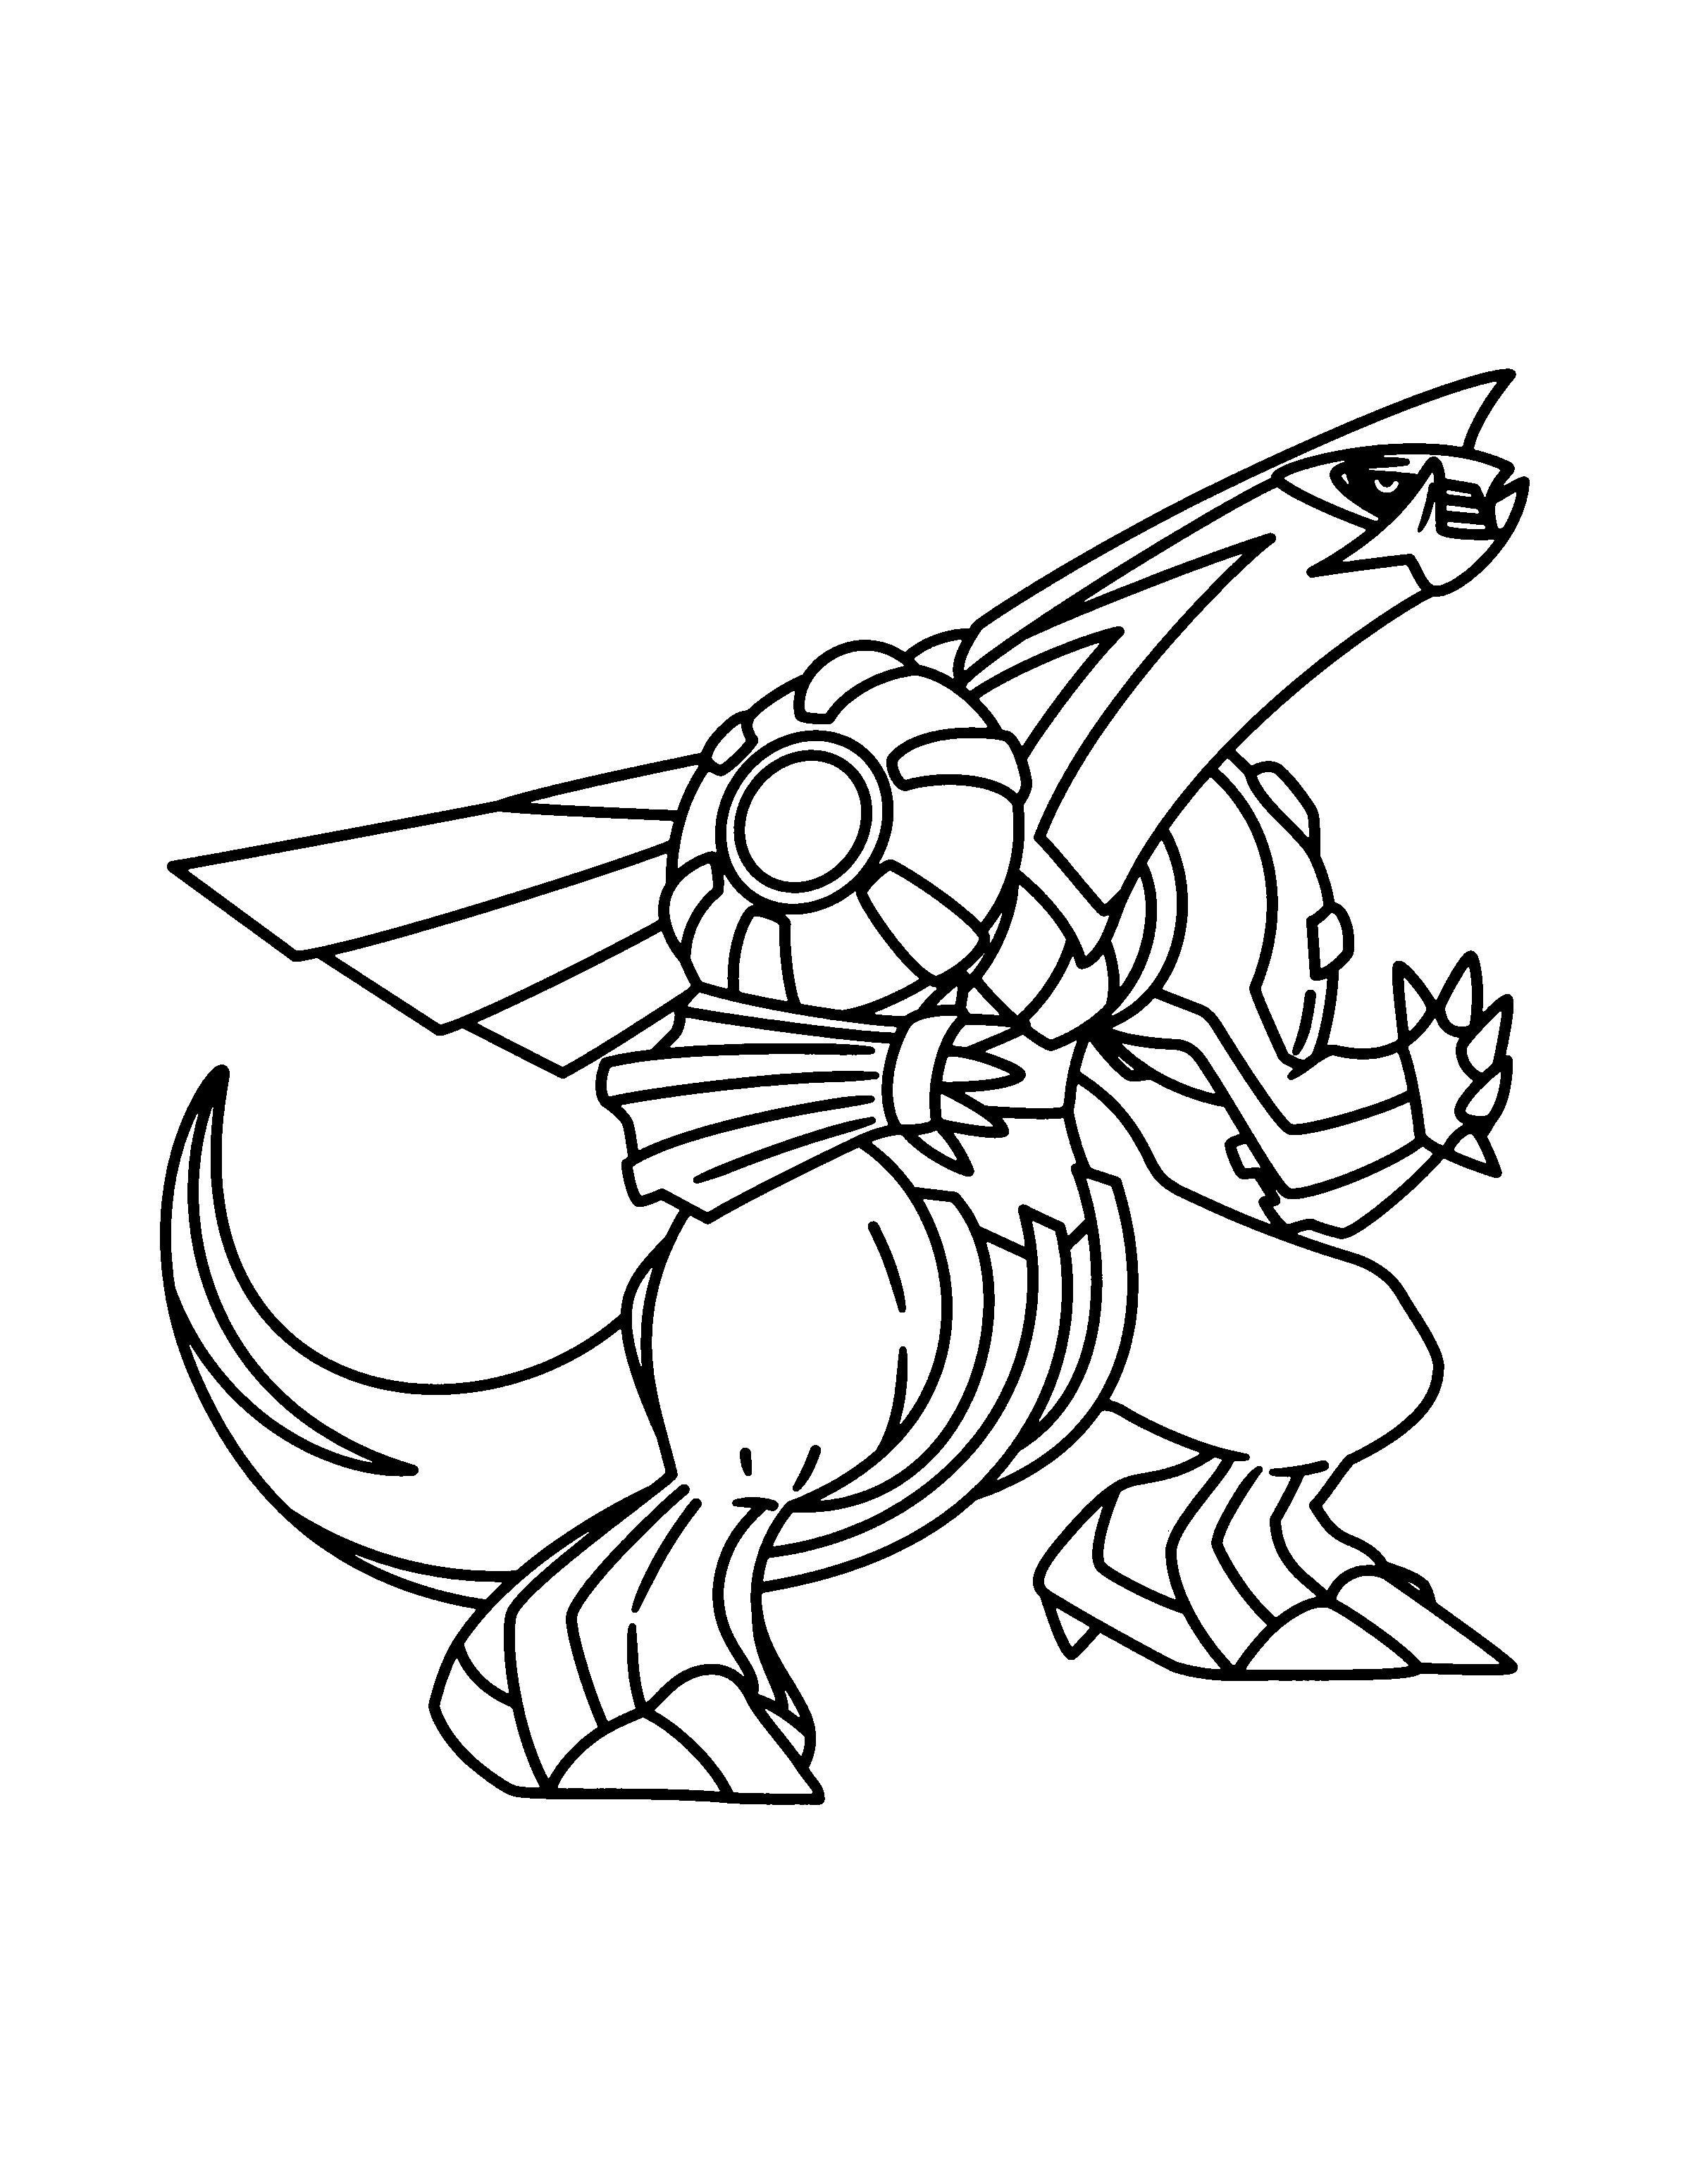 2400x3100 Pokemon Coloring Pages Palkia New Darkrai